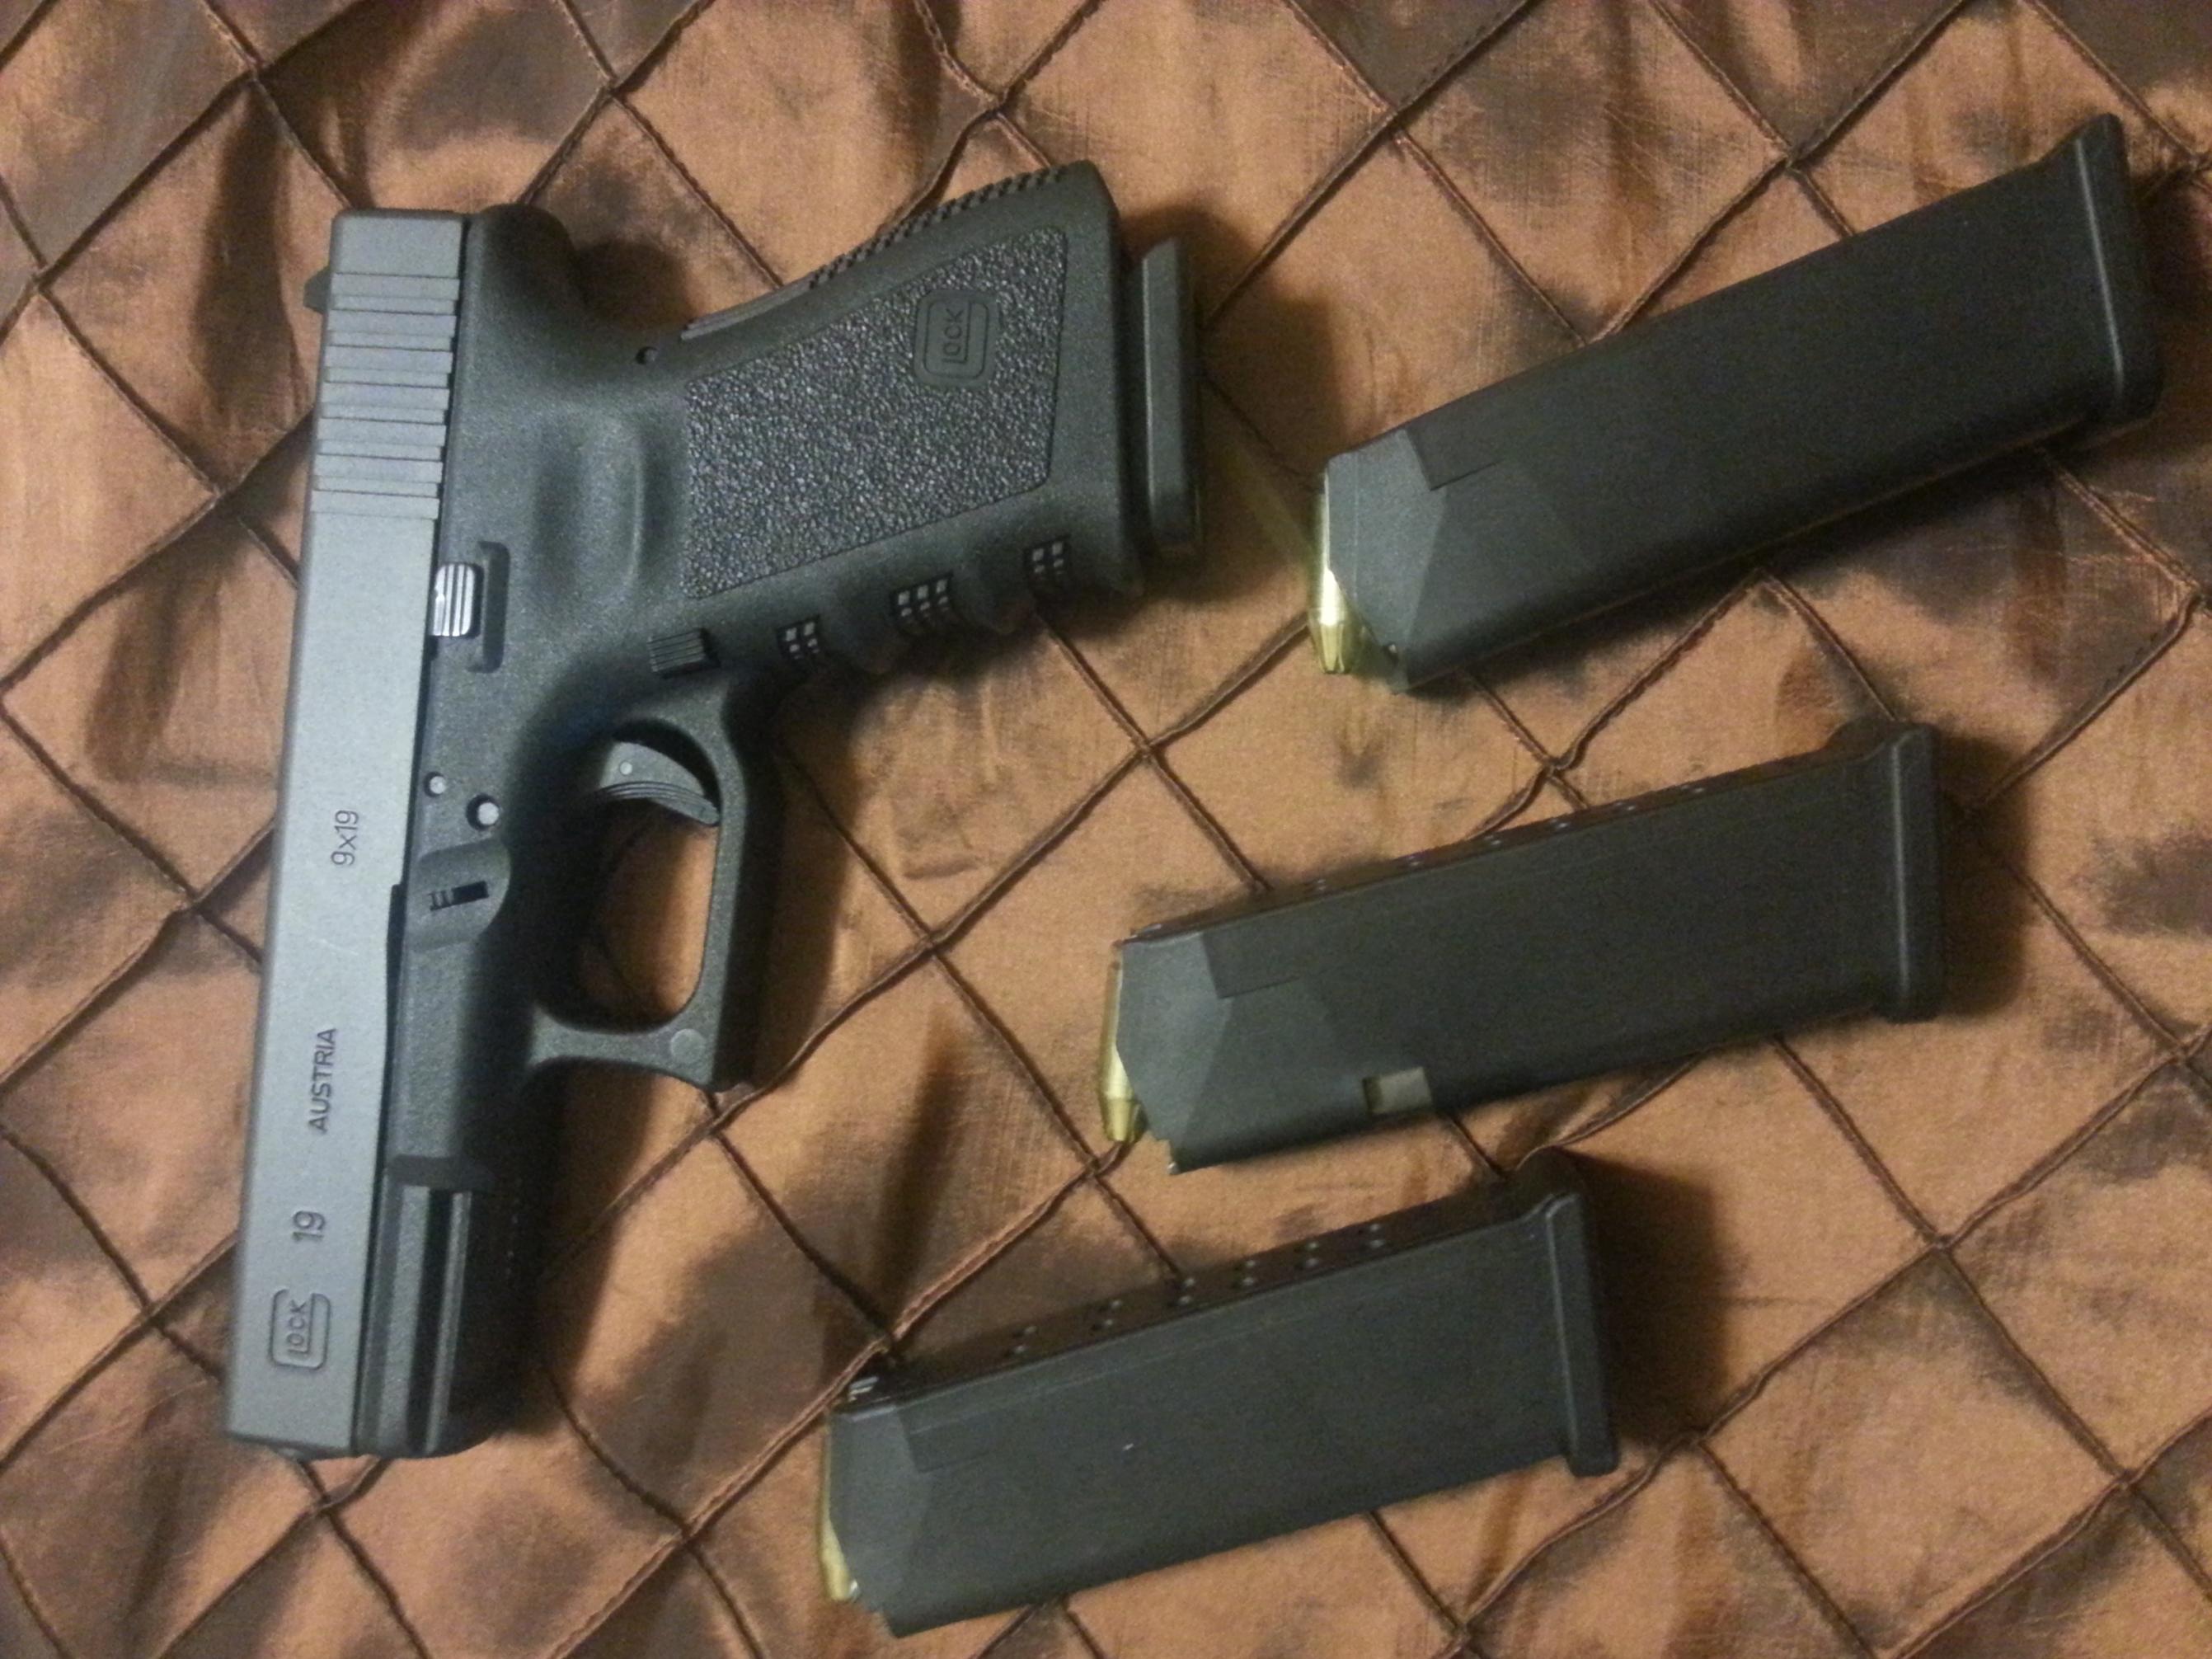 WTT New Glock G19 gen3, NS, 4High cap.mags, for Glock G29 or G30 (Broward County)-20130606_092458.jpg